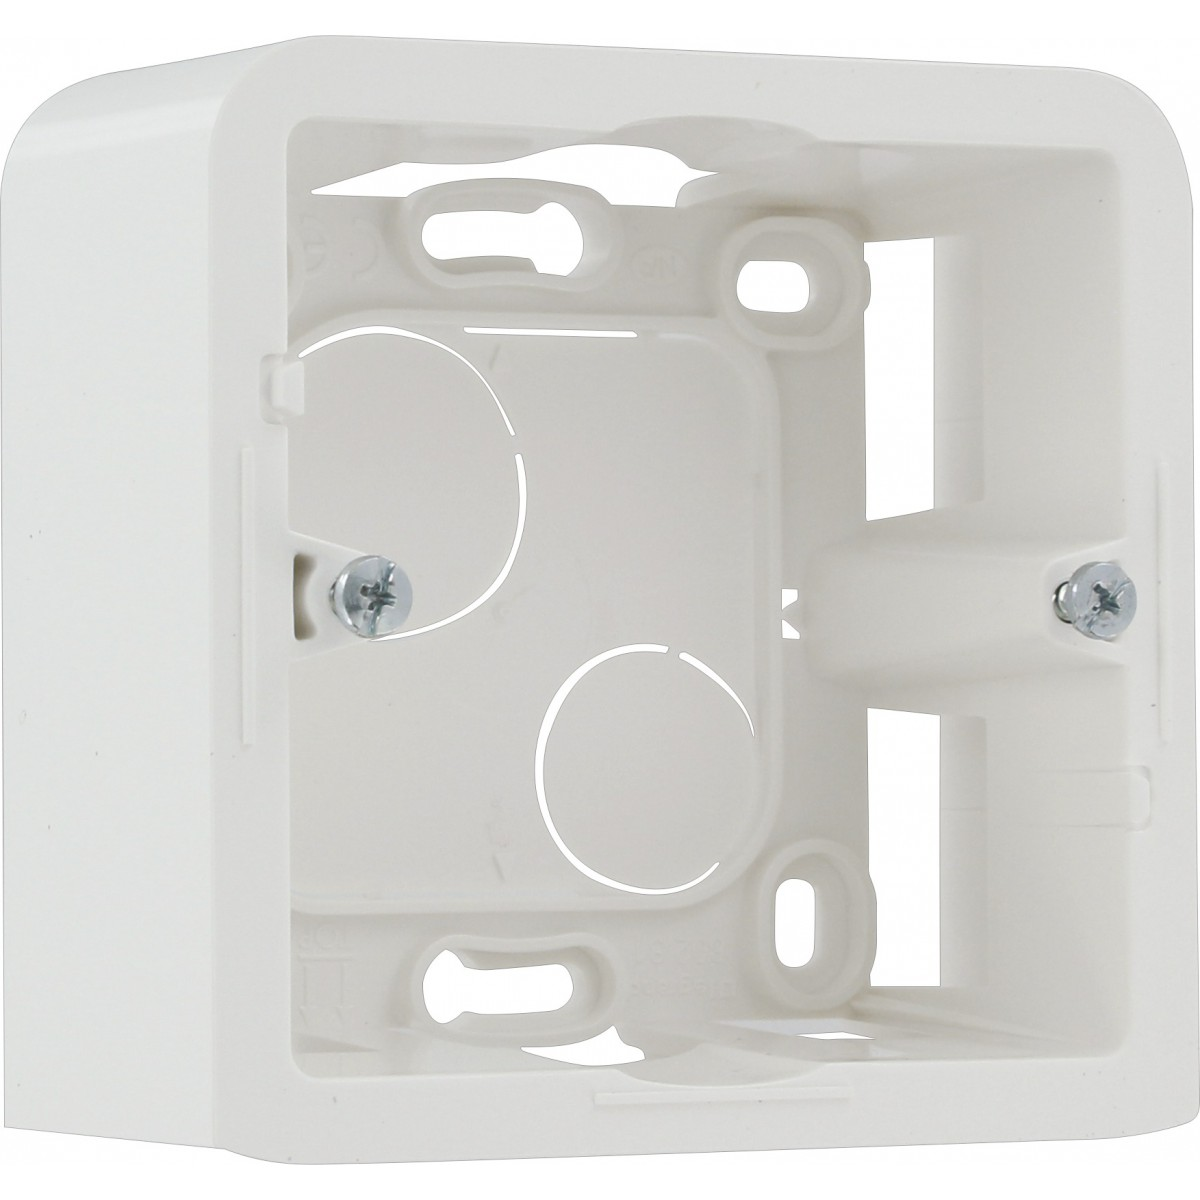 Cadre blanc sans support Legrand - Mosaïc - 2 modules - Profondeur 40 mm